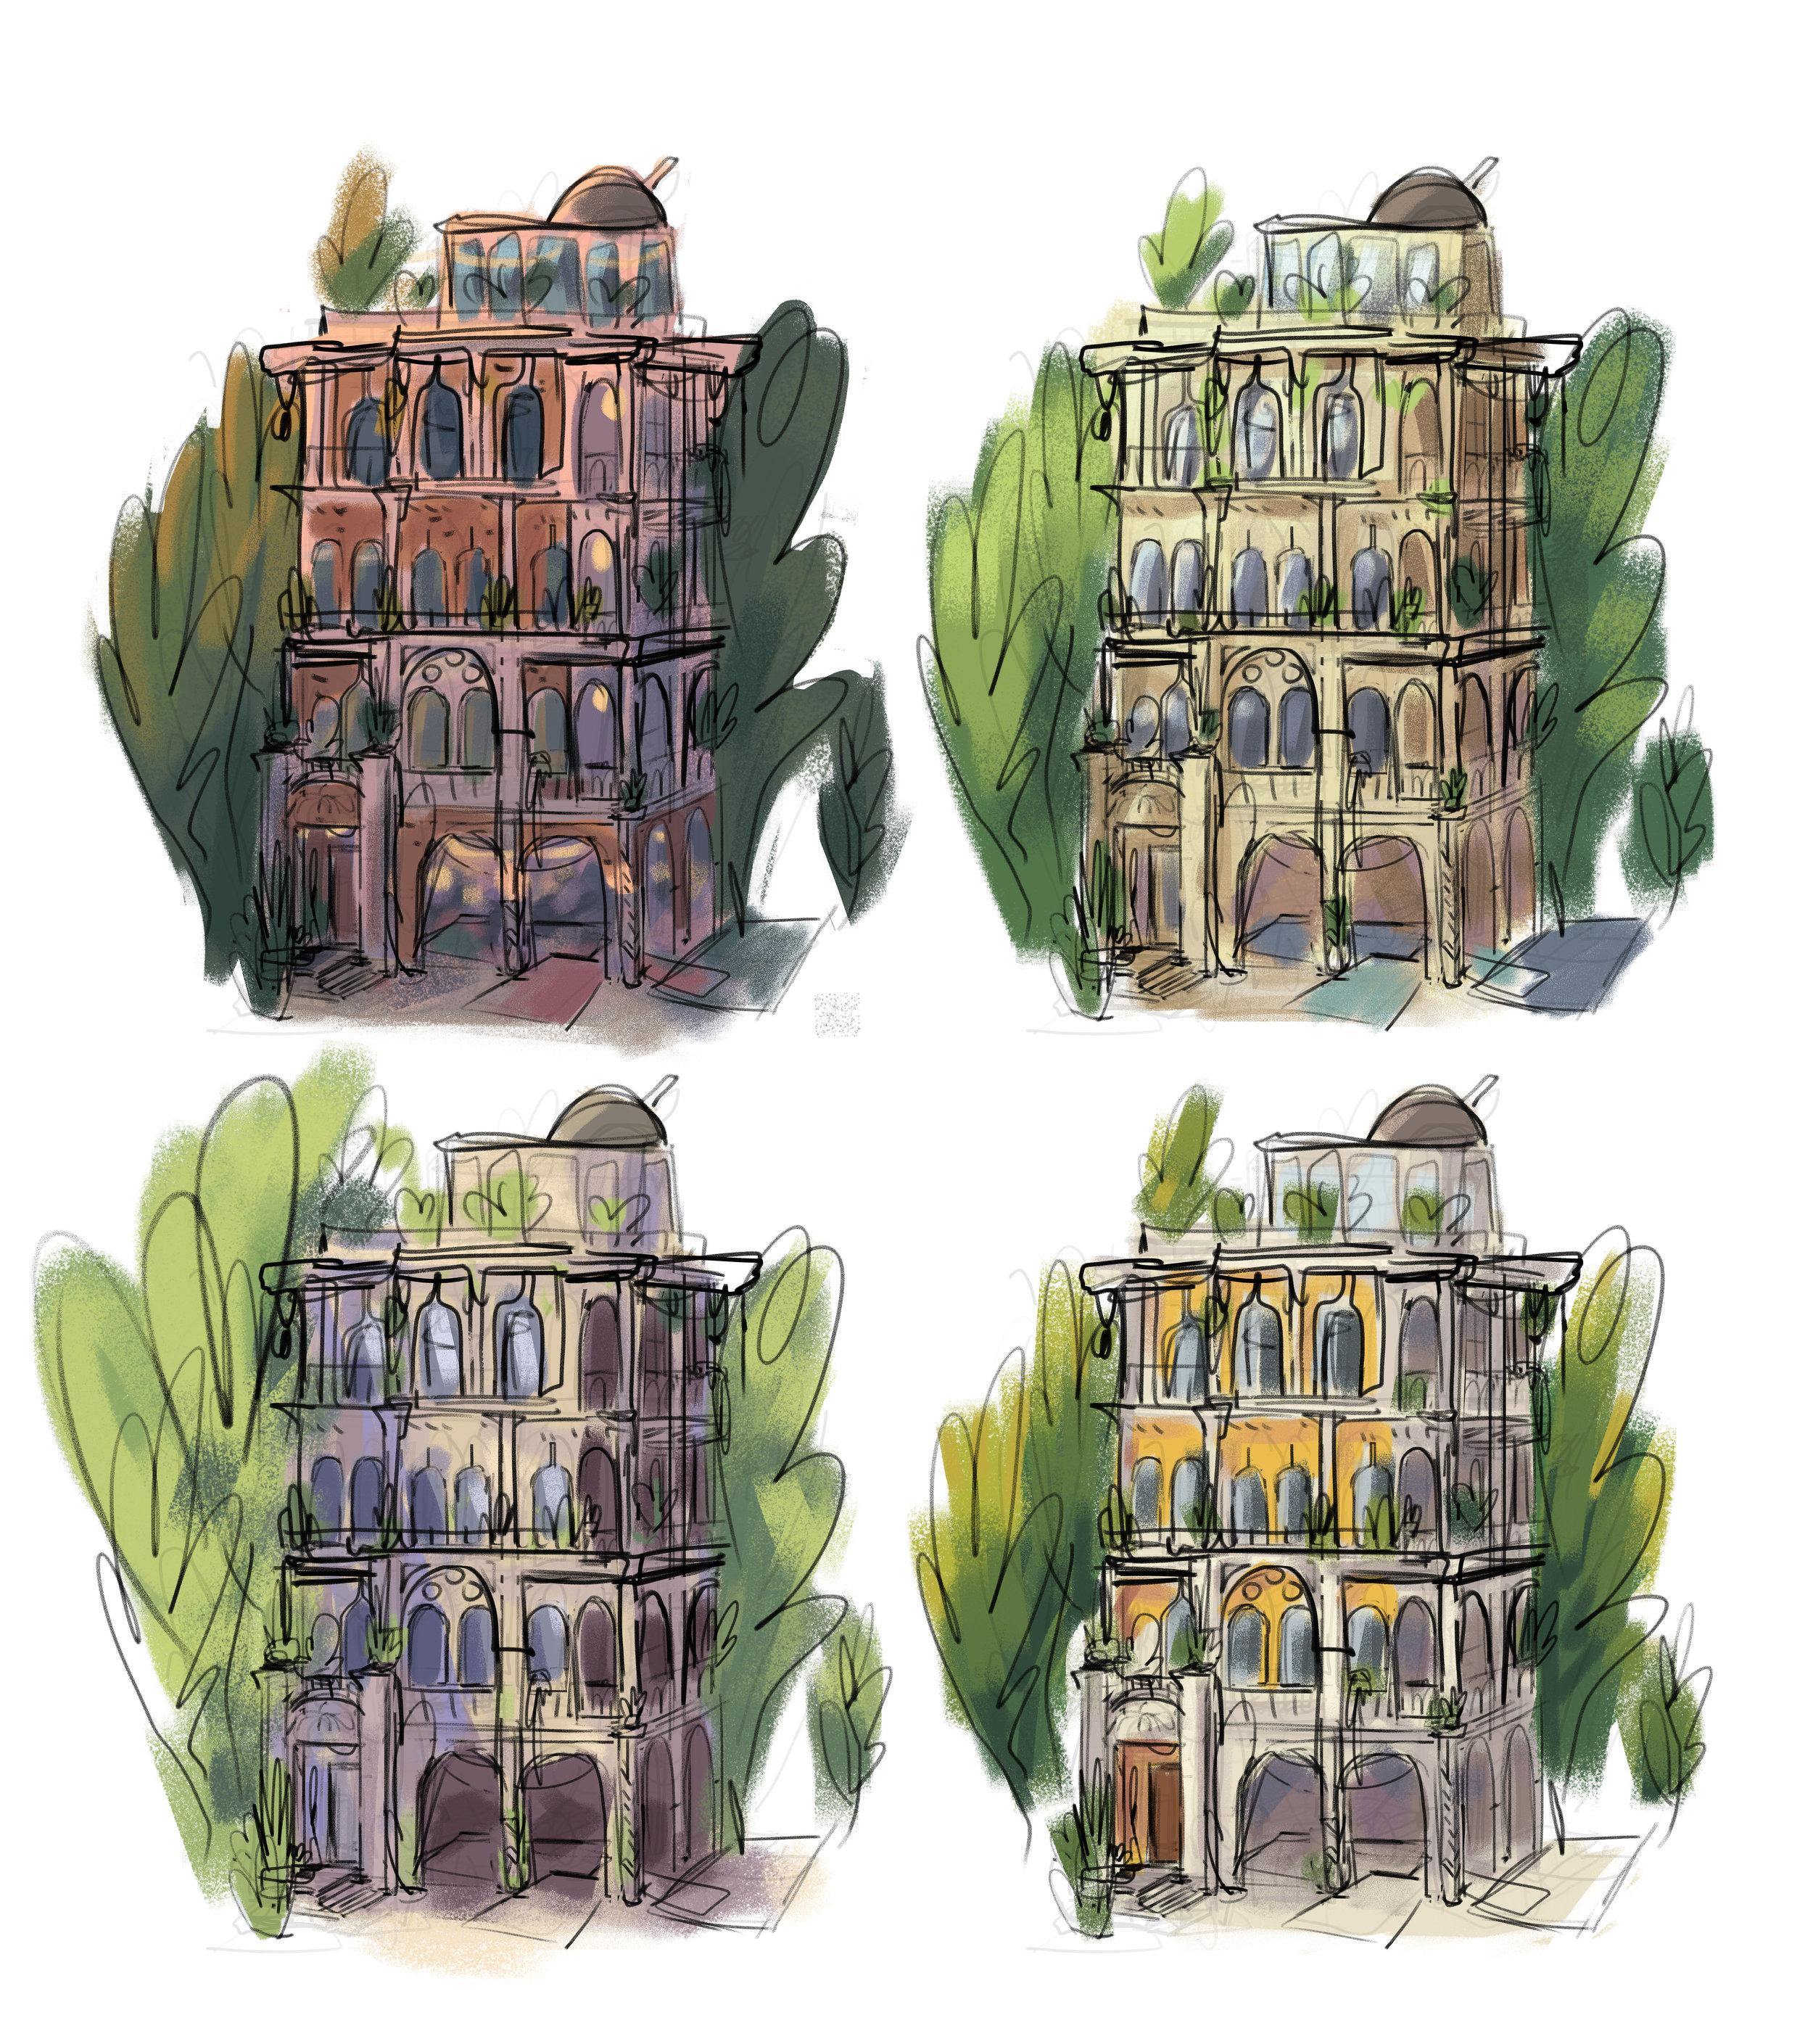 prj450_environment_apartment_colorthumbnails.jpg